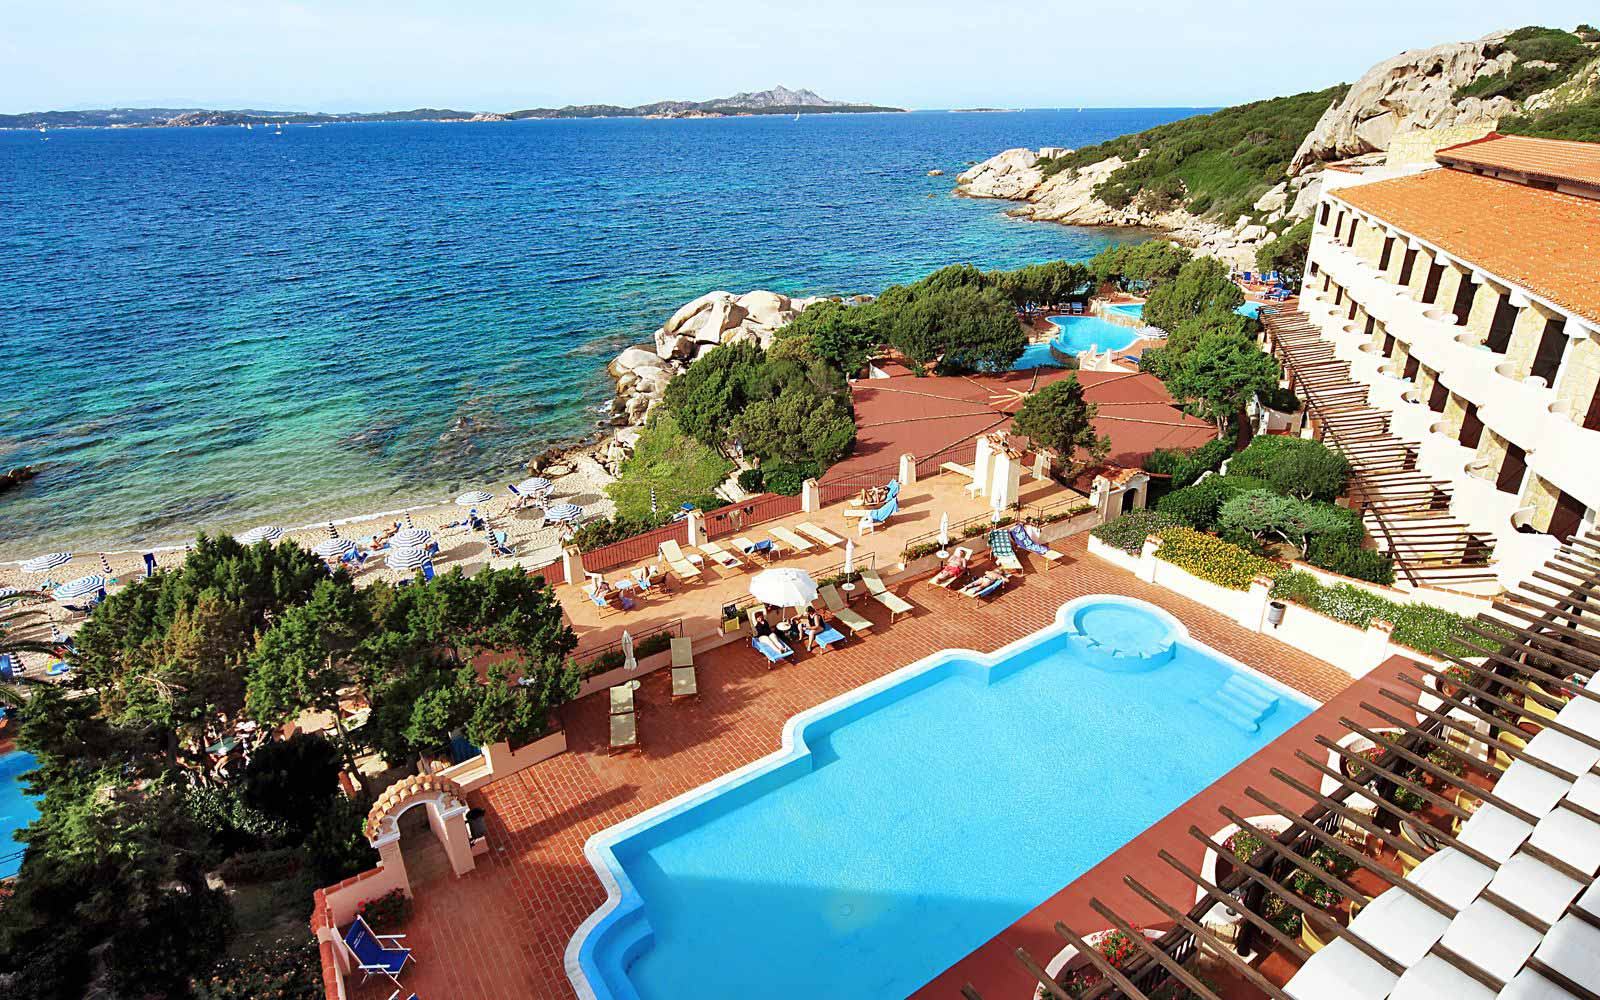 Grand hotel smeraldo beach baia sardinia sardatur holidays - Public swimming pools in rehoboth beach ...